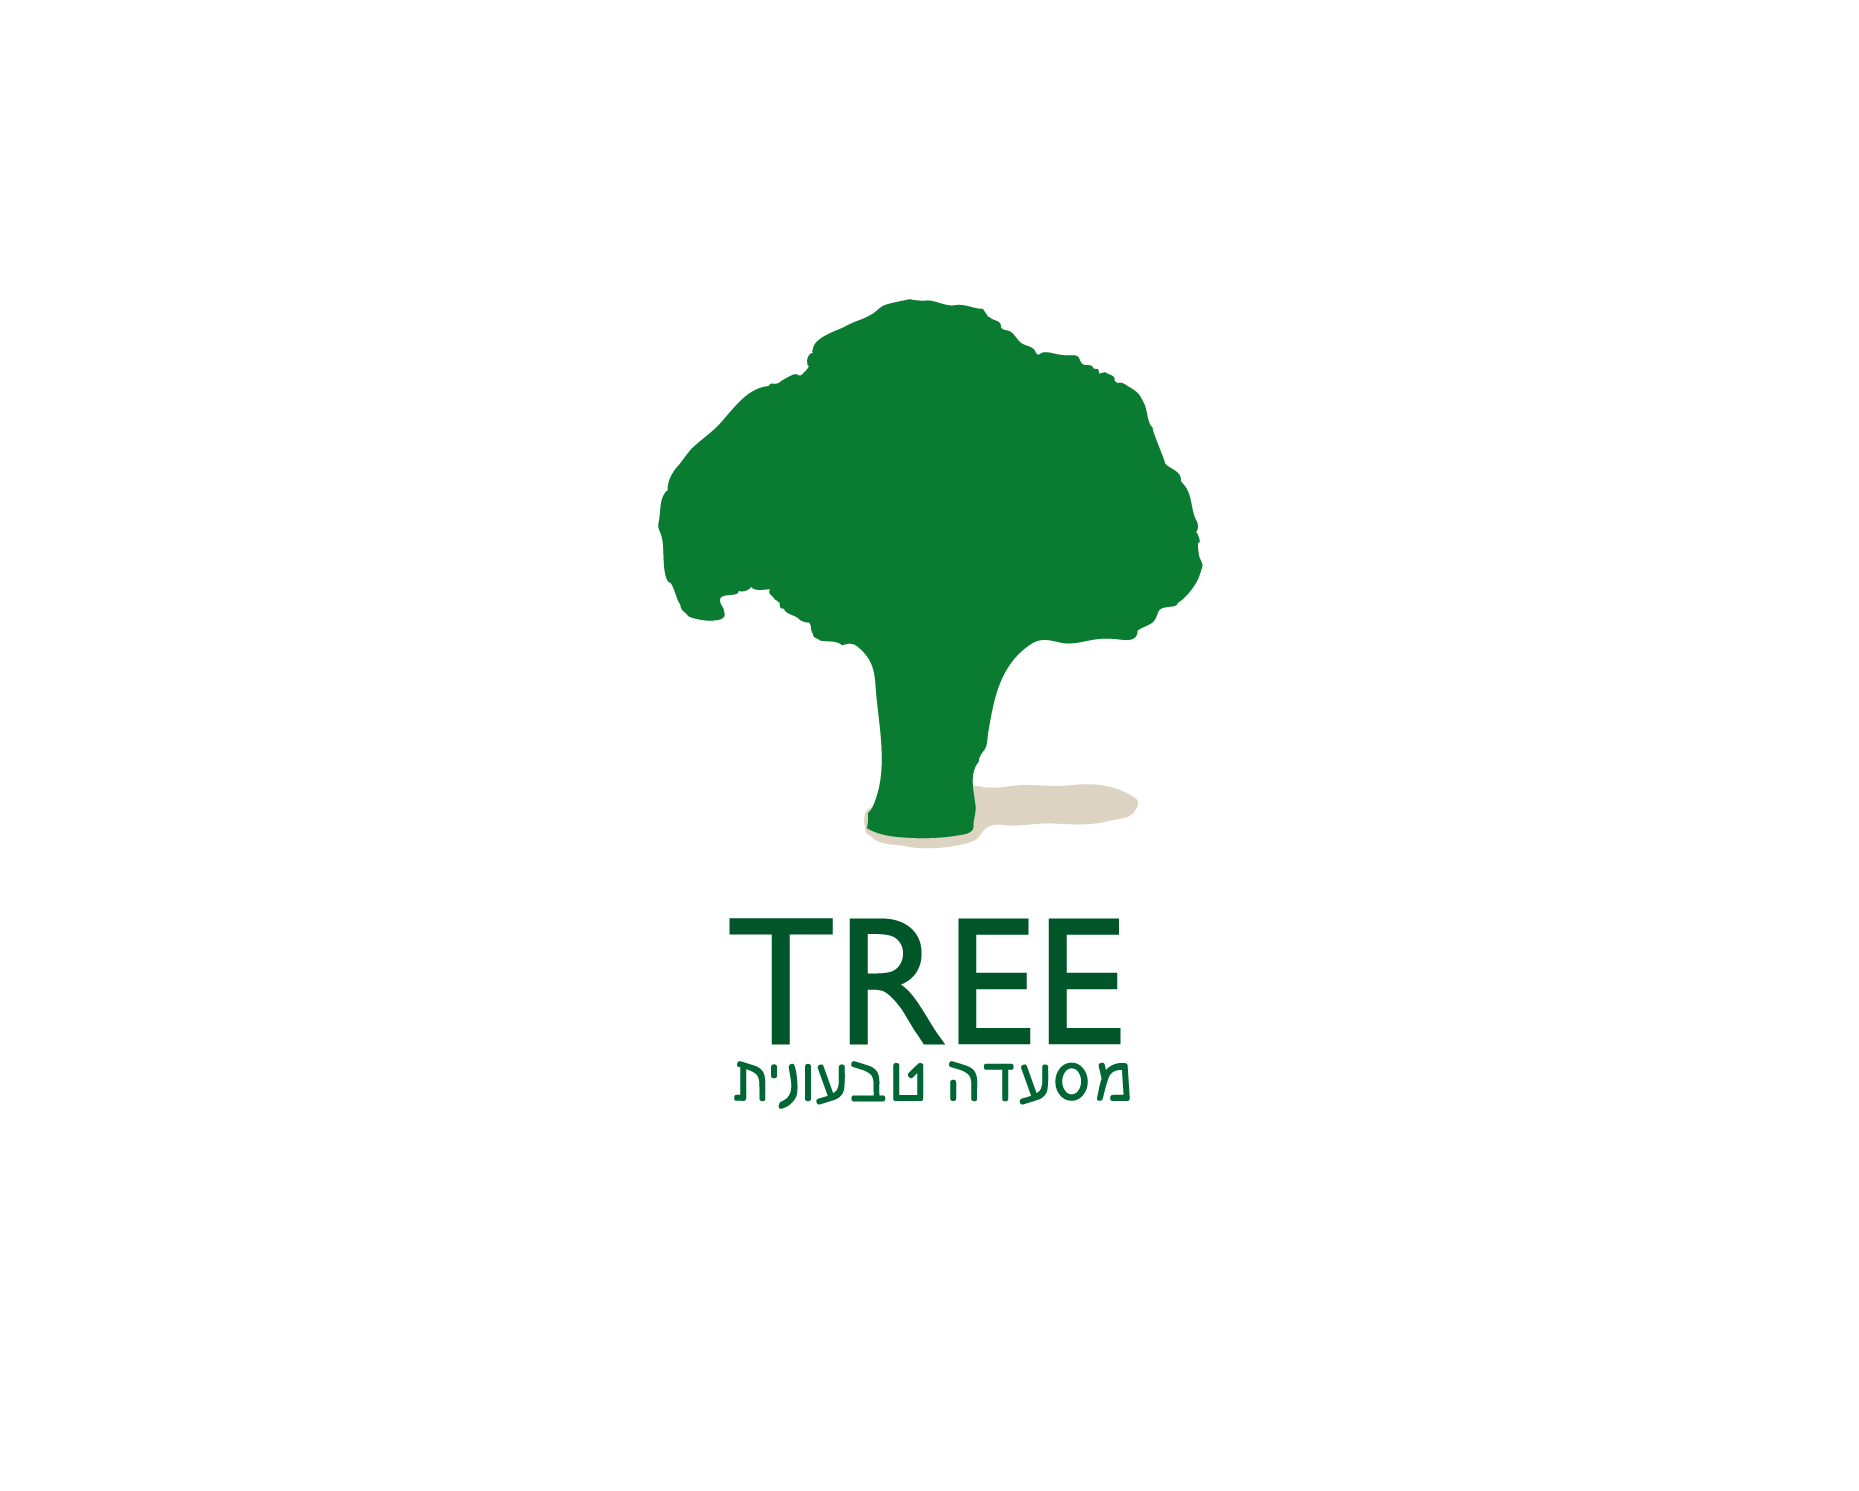 tree222-03